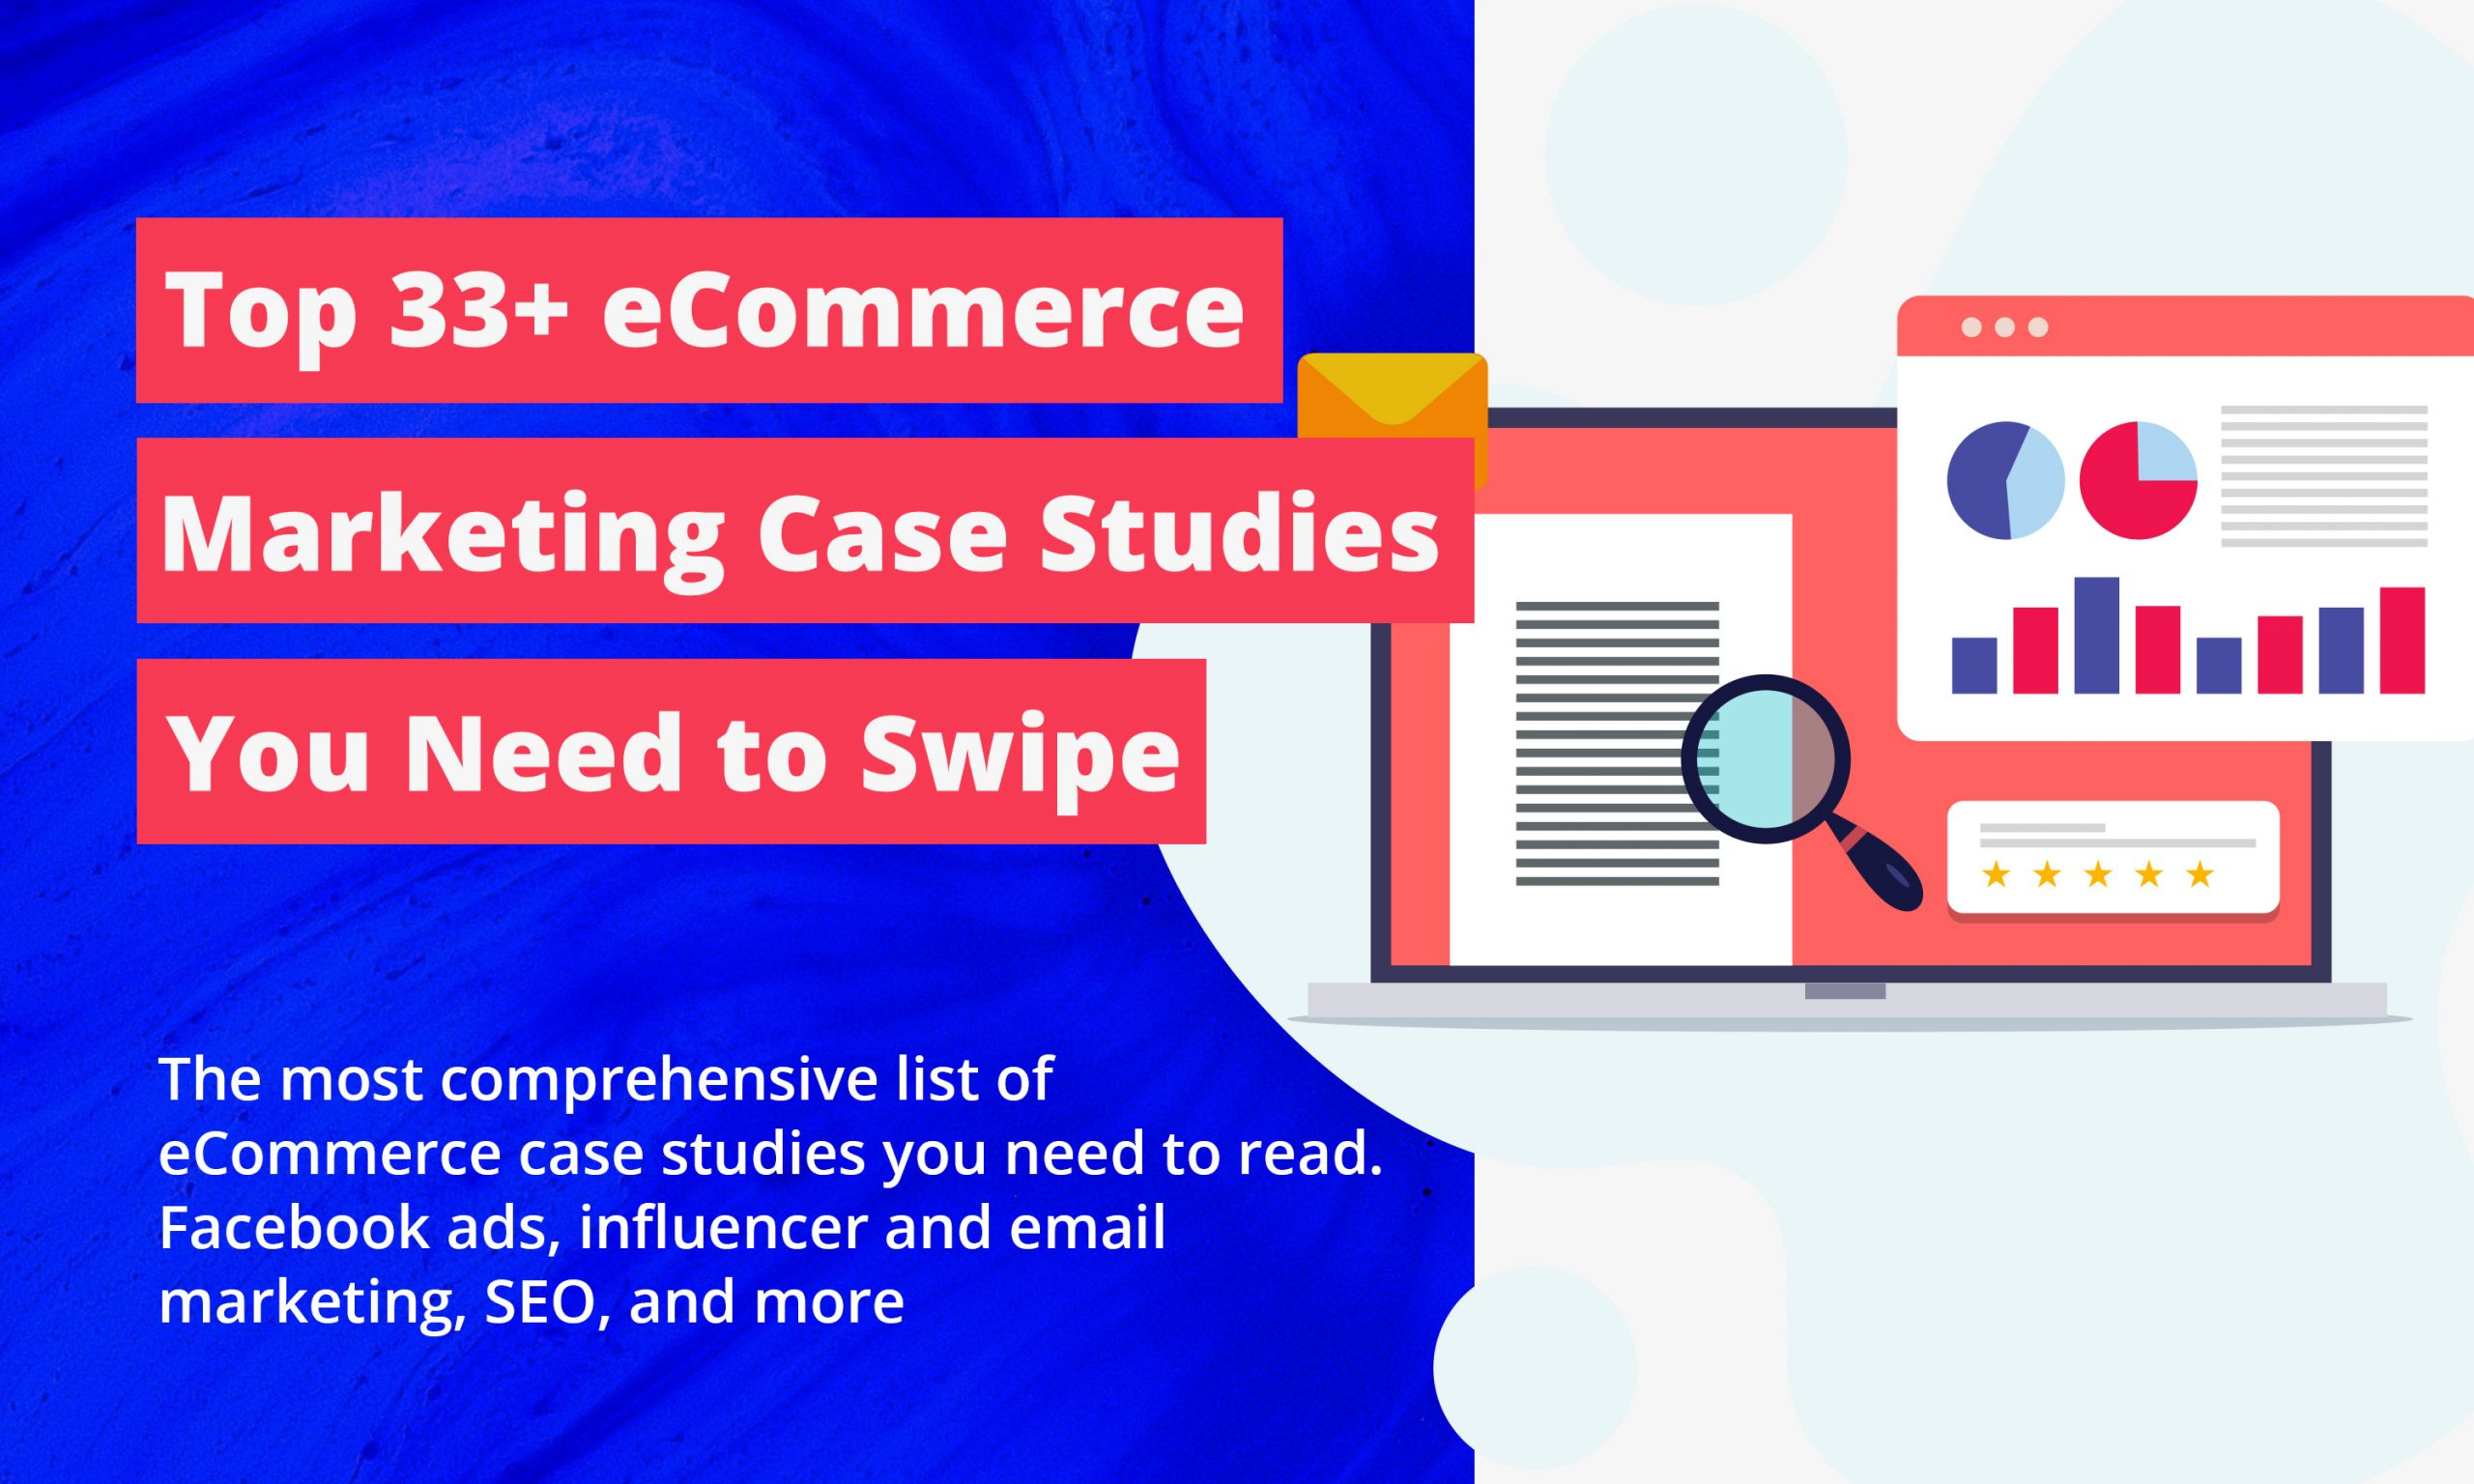 Top 33+ eCommerce Marketing Case Studies You Need to Swipe